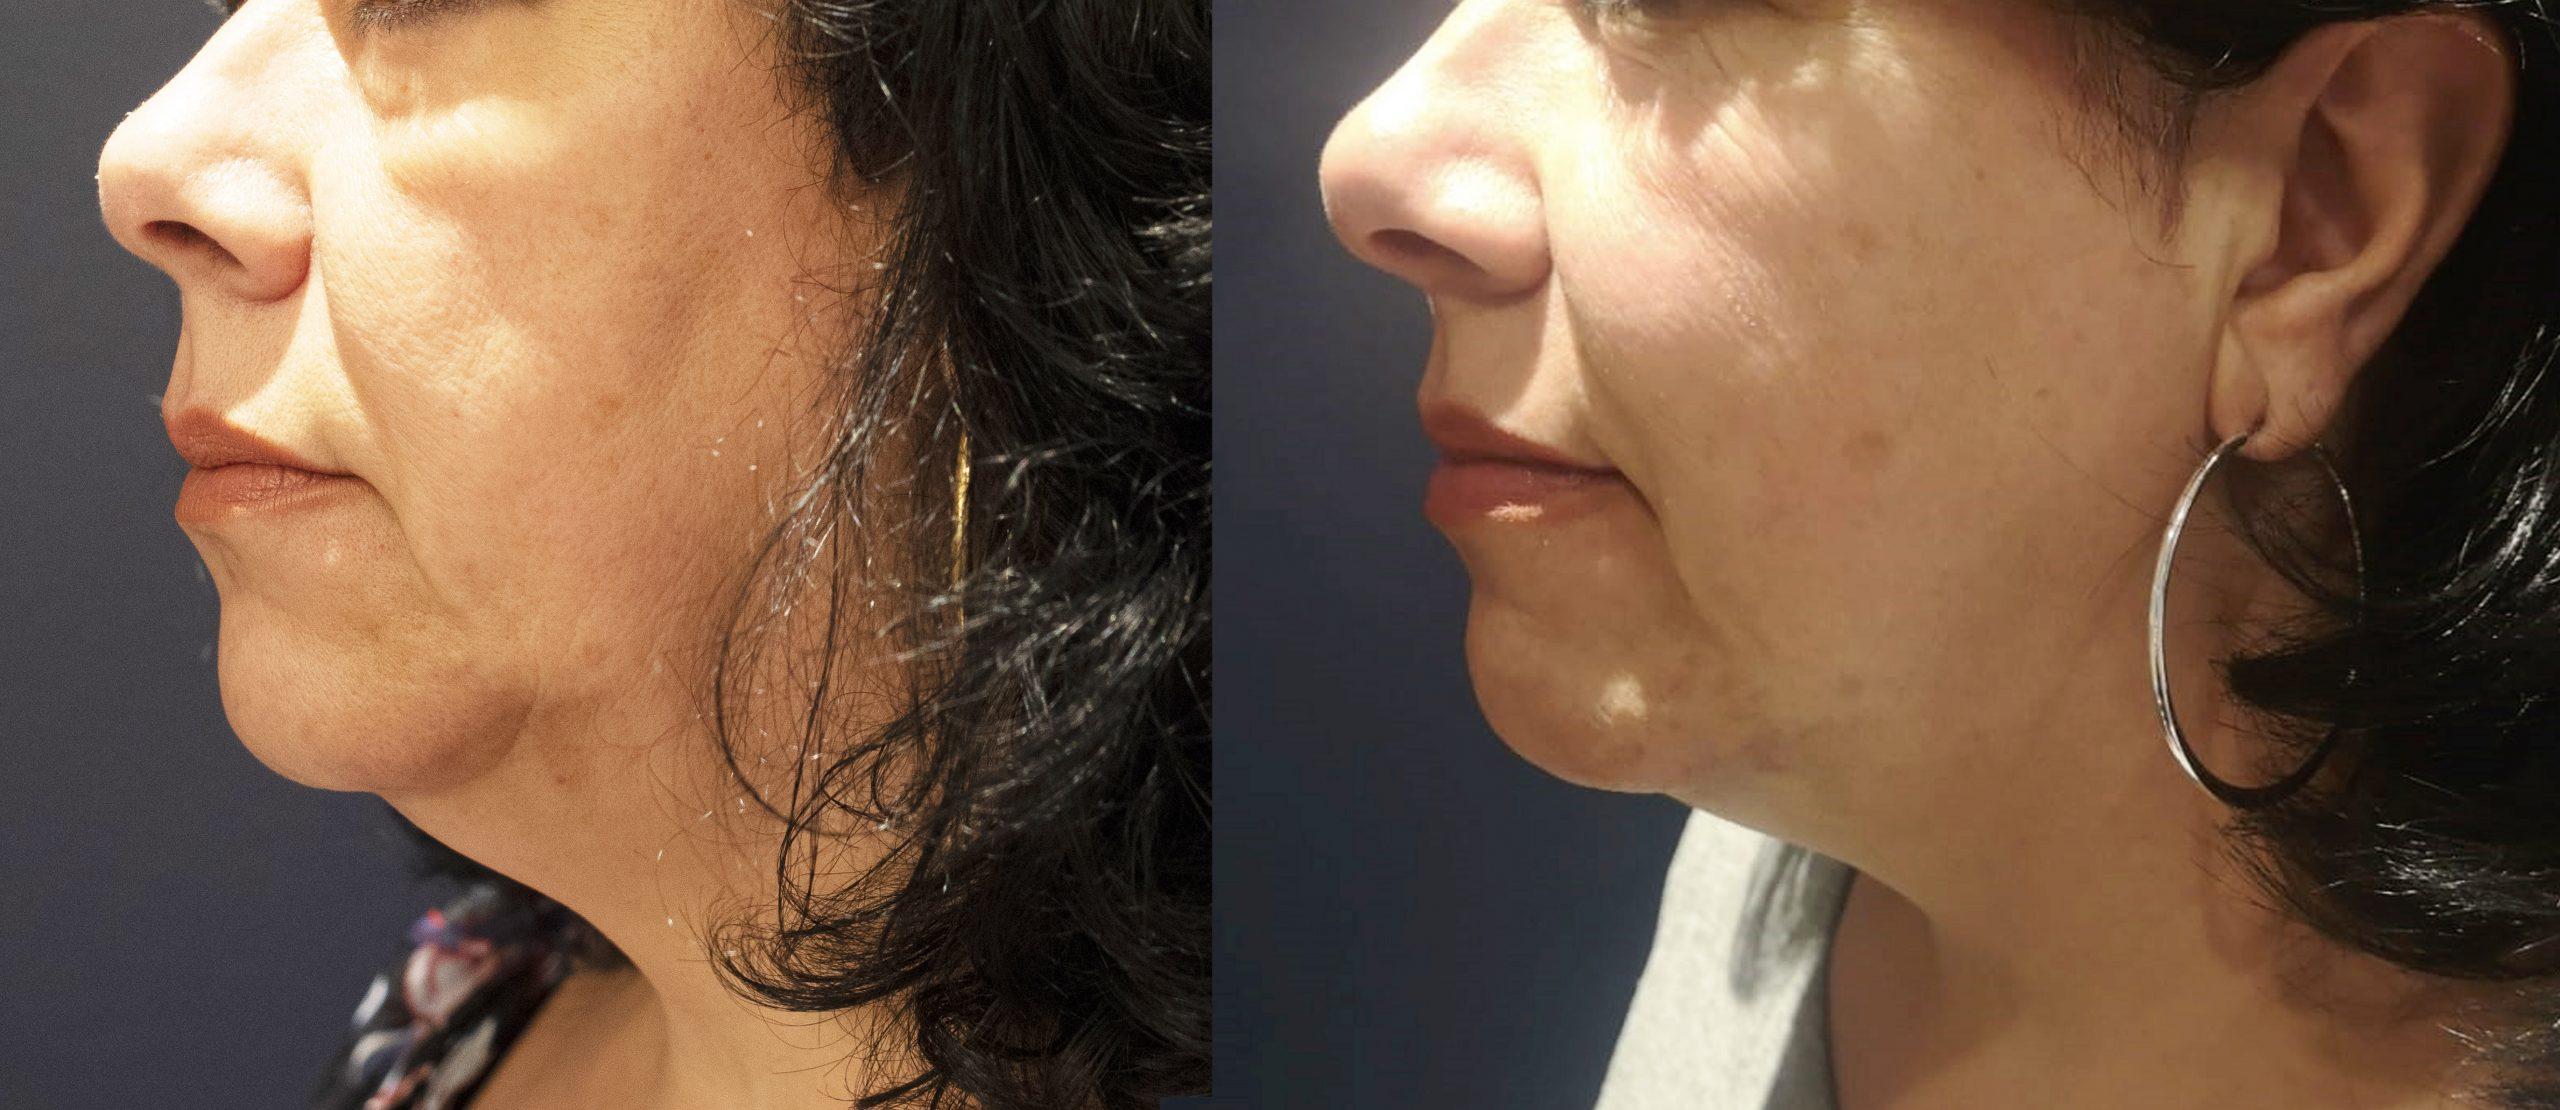 Morpheus8 Skin Tightening 3 Months After